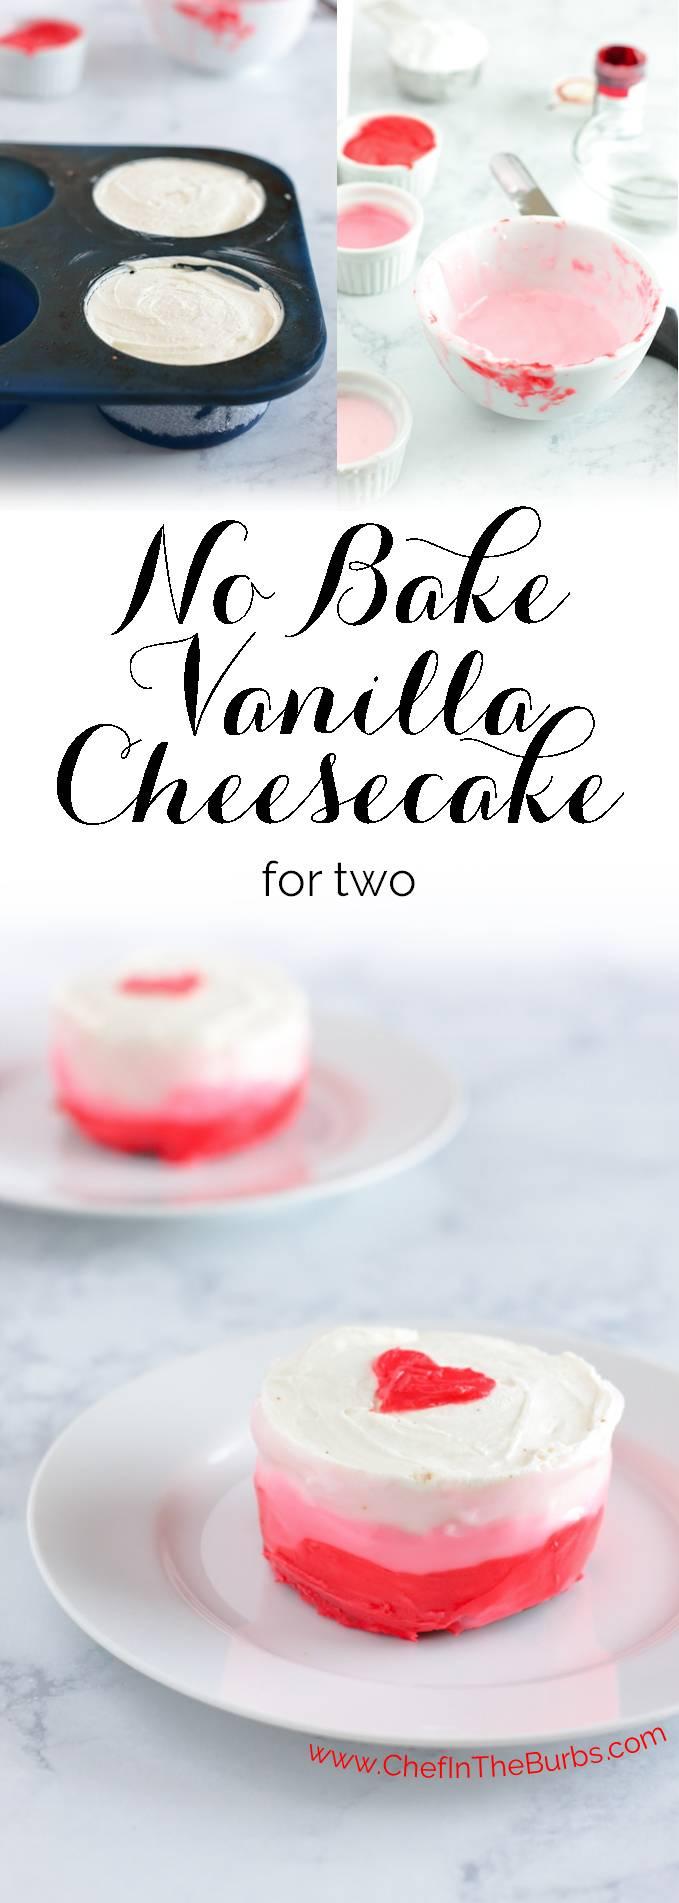 No-Bake-Vanilla-Bean-Cheesecake-for-Two-1